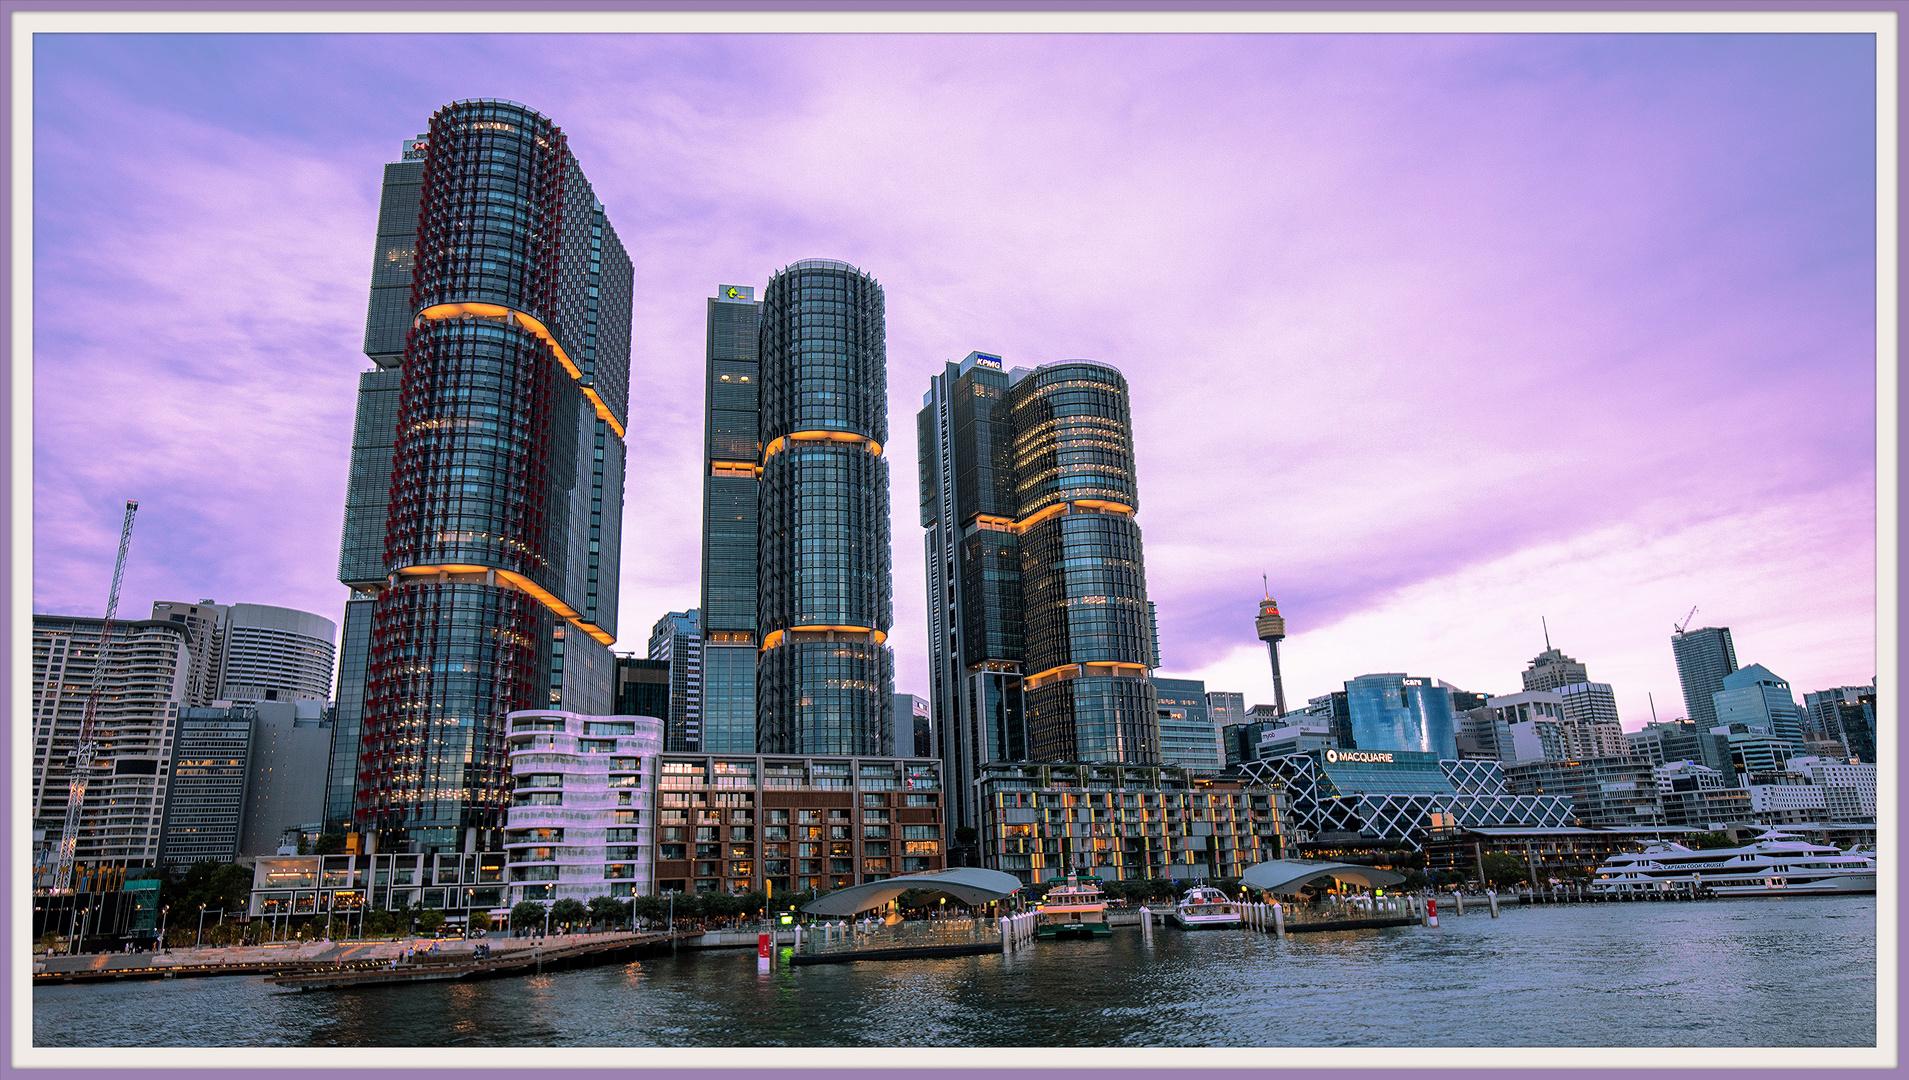 Barangaroo Towers and Wharf, Darling Harbour